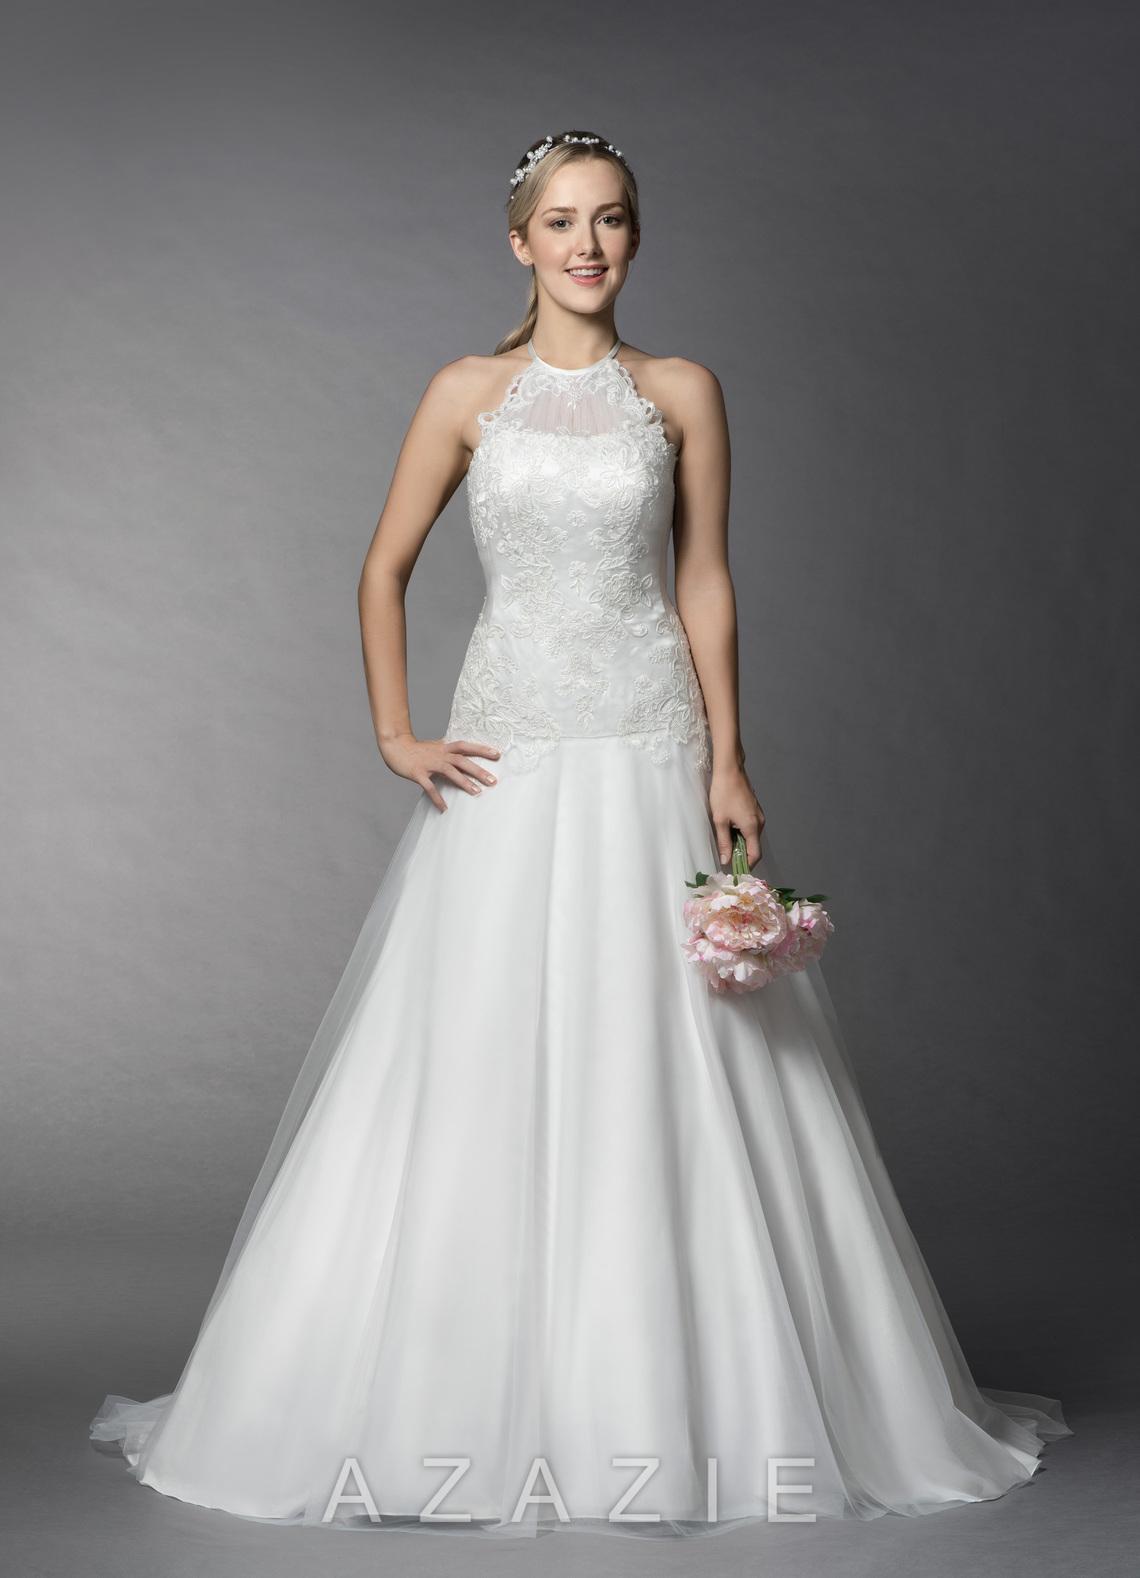 Wedding Dress in Kenya